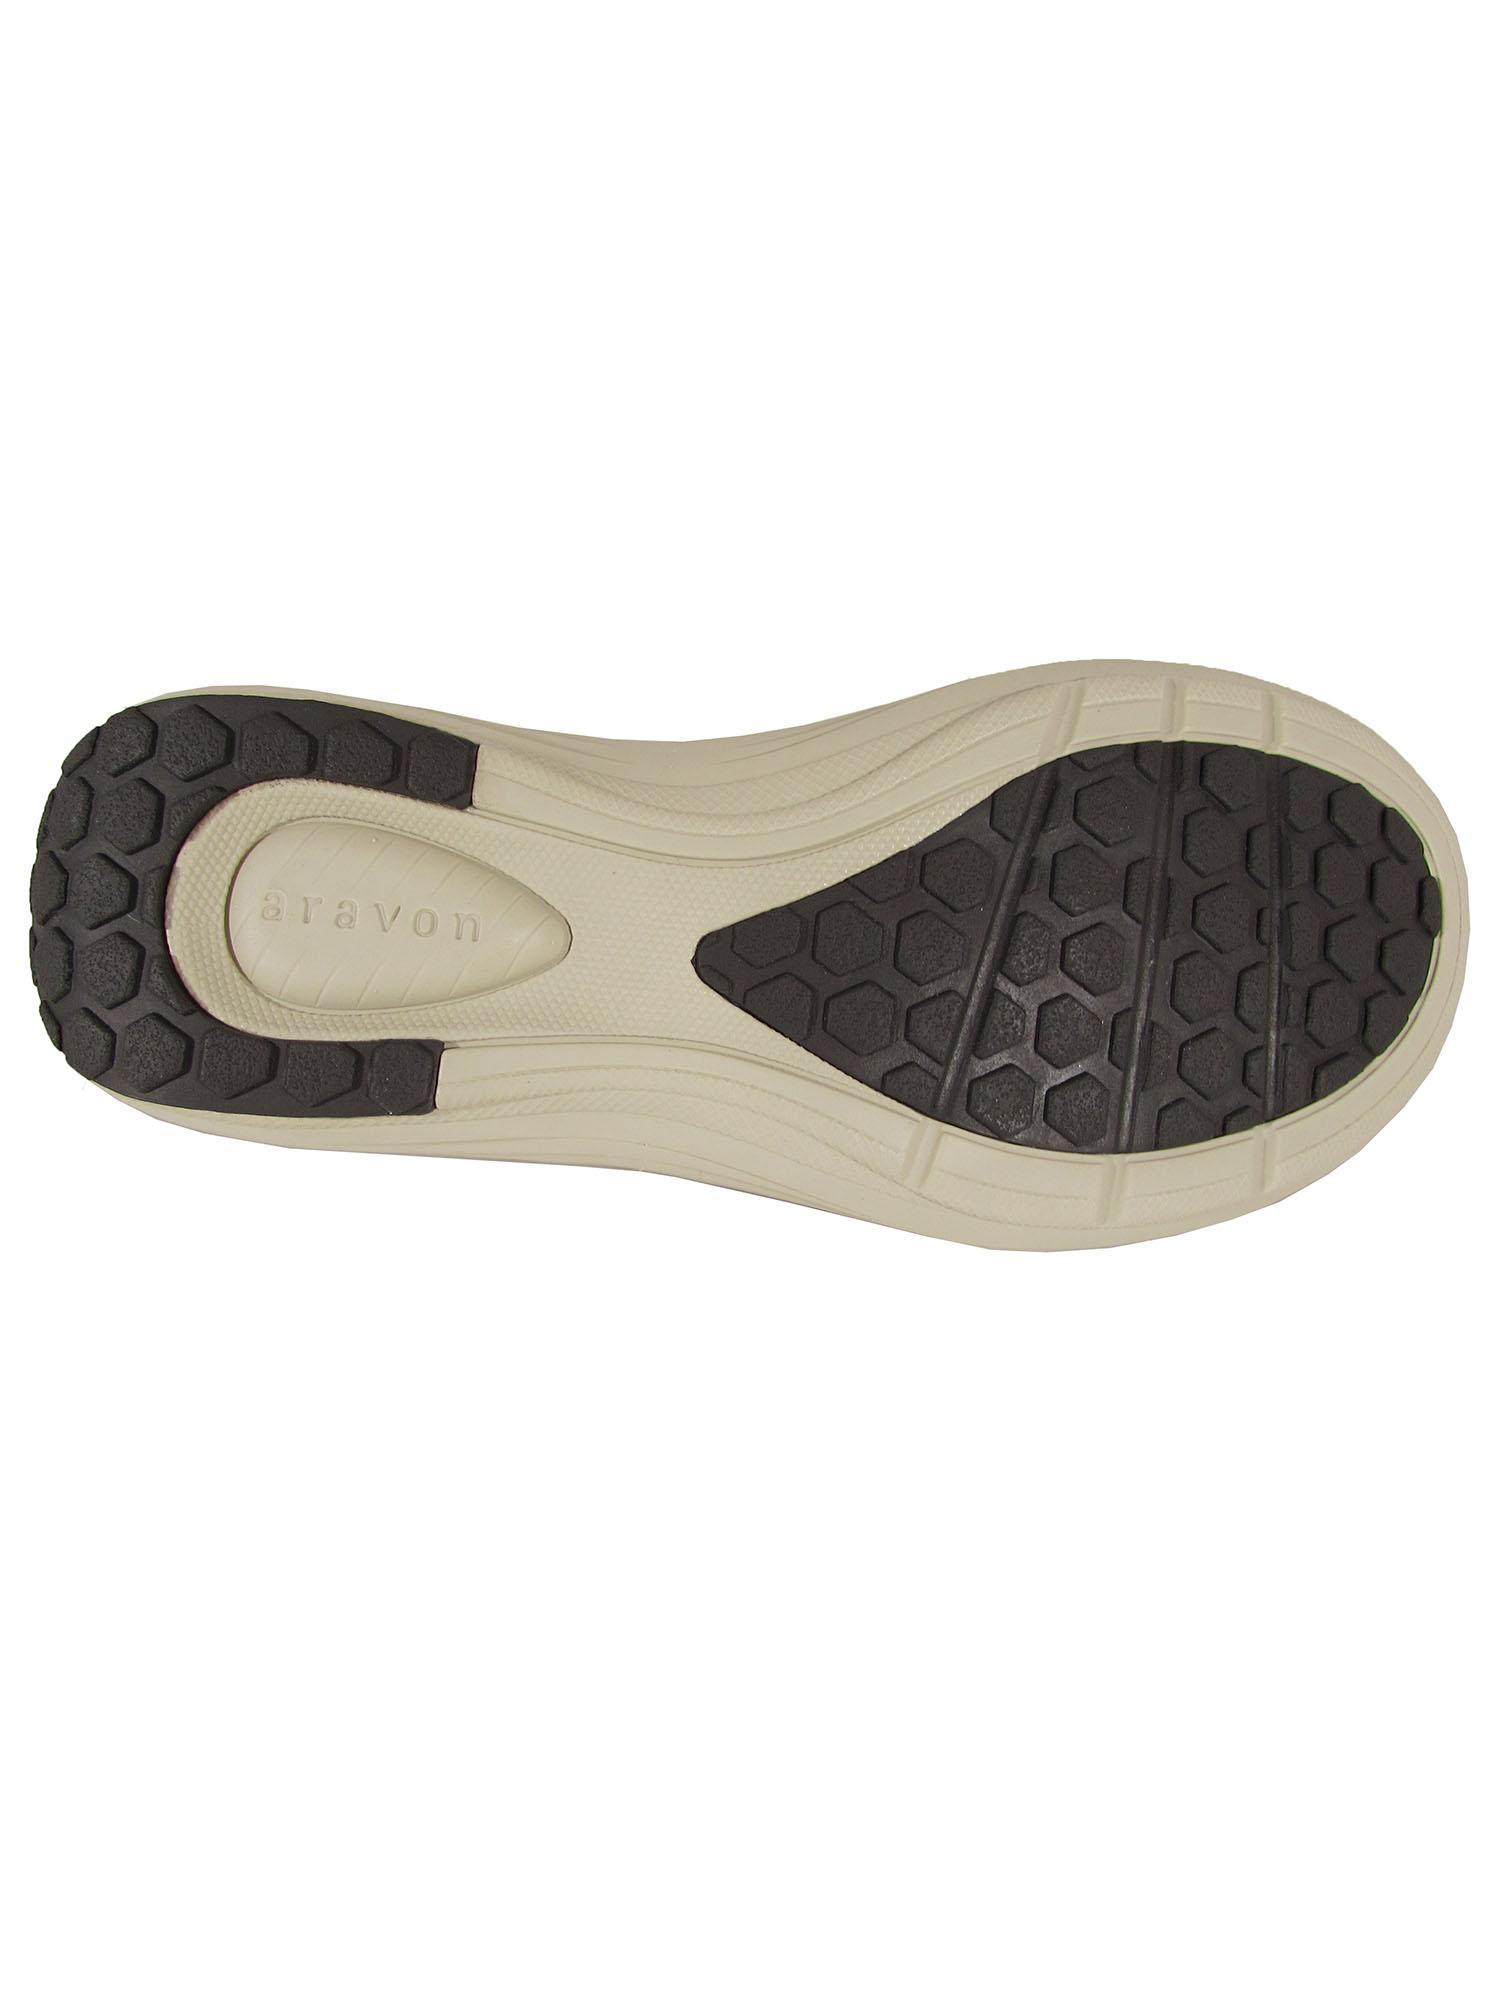 Aravon-Womens-Bonnie-AR-Slip-On-Loafer-Shoes miniatura 9